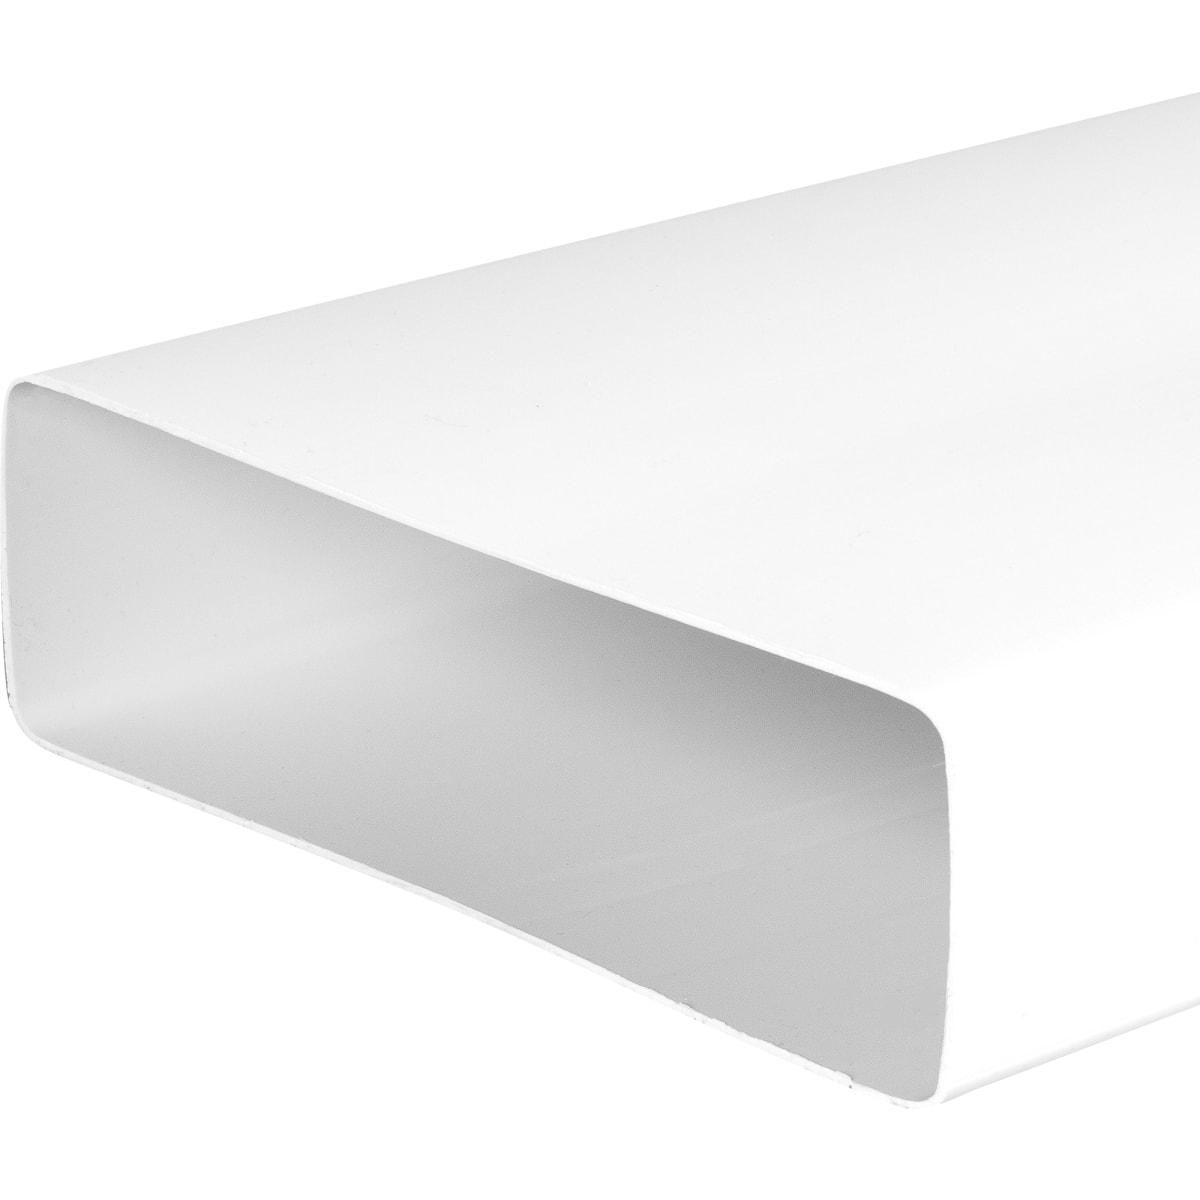 Канал плоский Equation, 60x204x500 мм